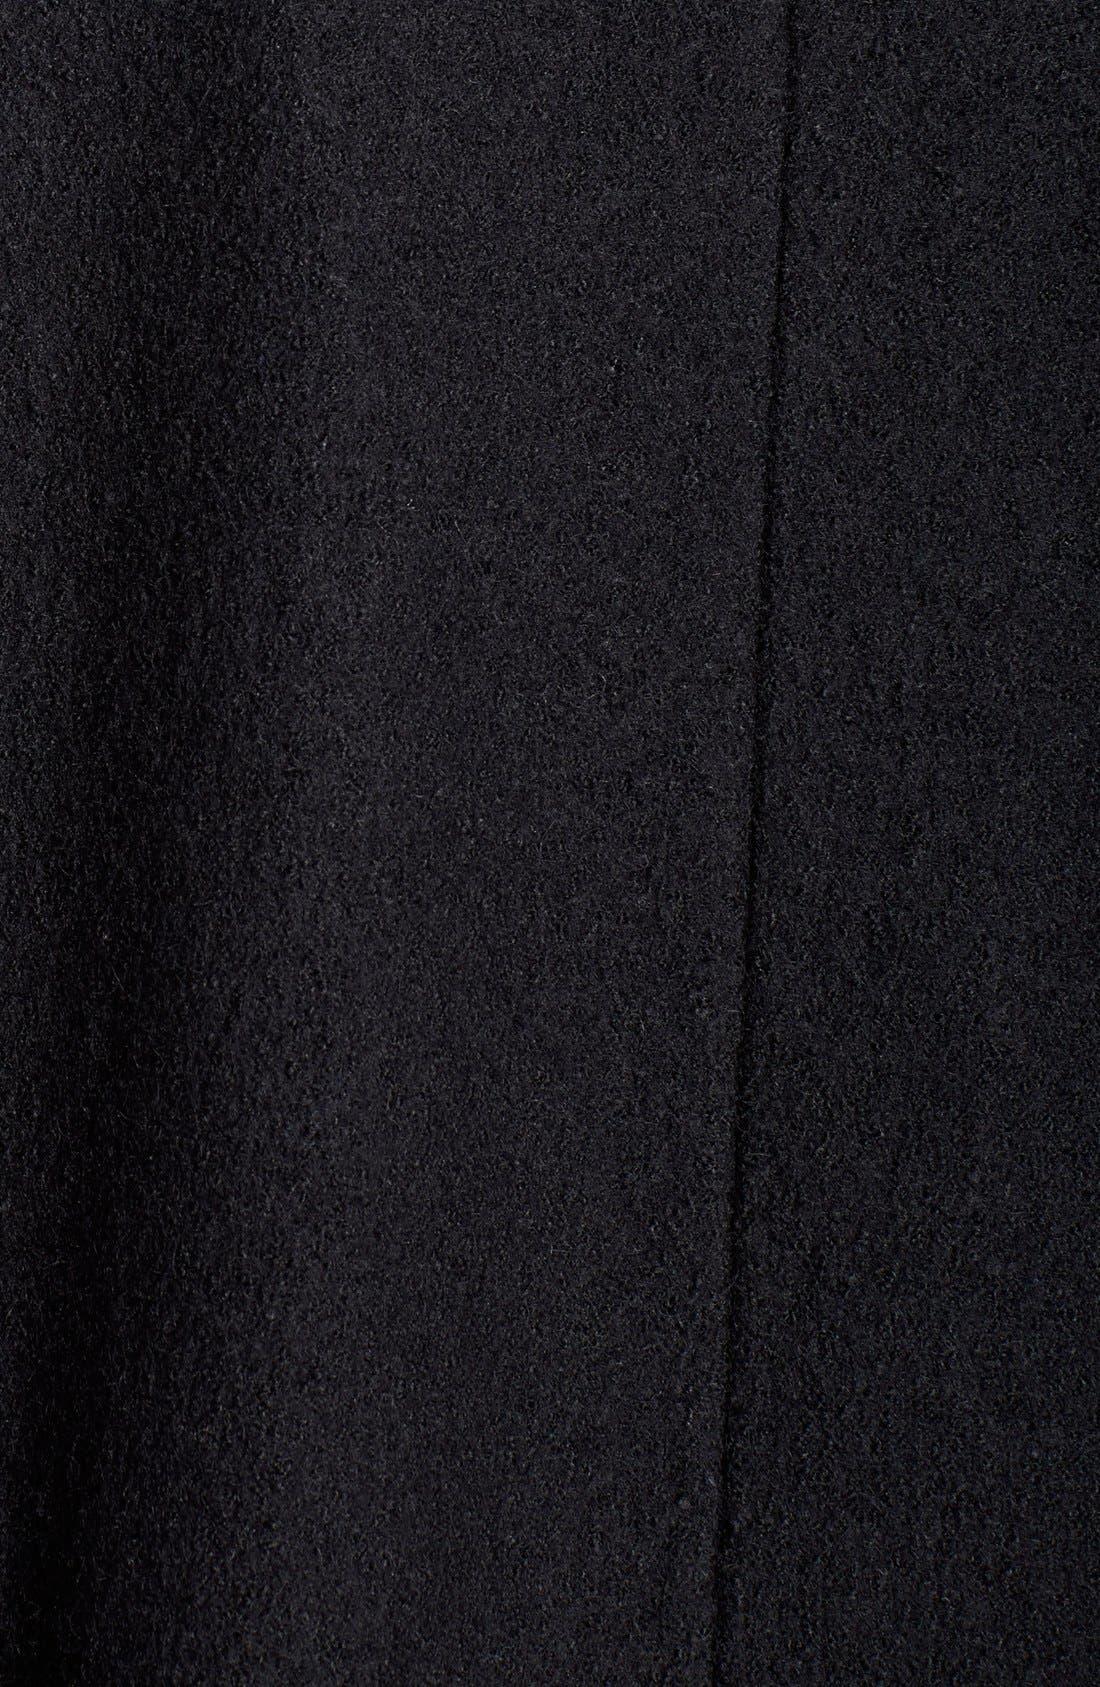 Hooded Boiled Wool Blend Swing Coat,                             Alternate thumbnail 2, color,                             001